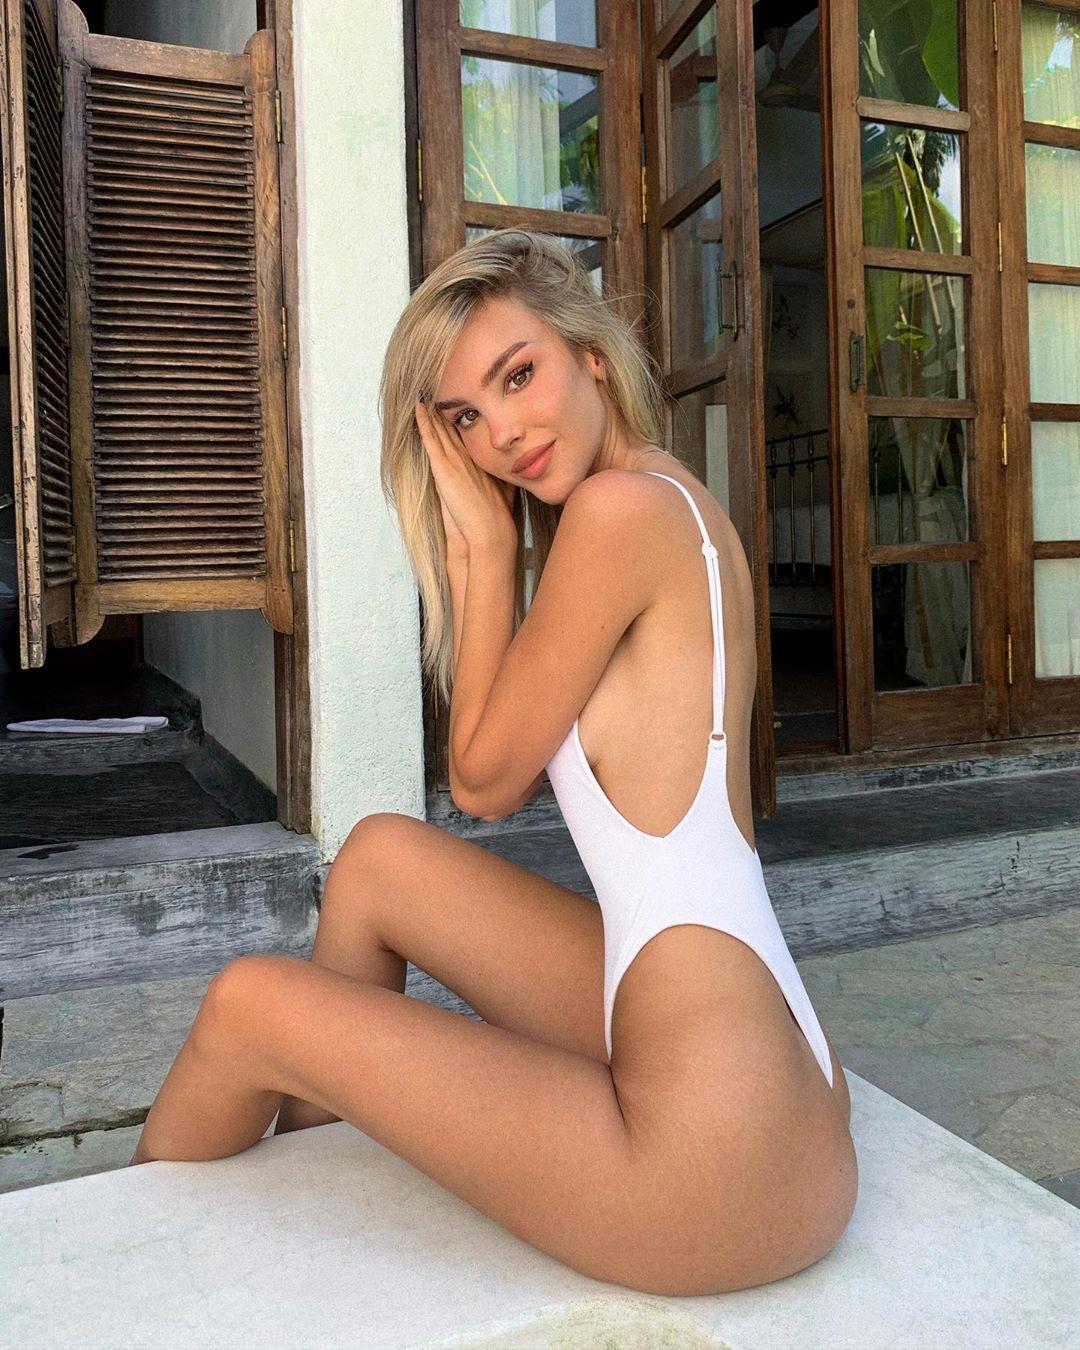 Maria Domark photoshoot ideas, hot legs girls, legs picture